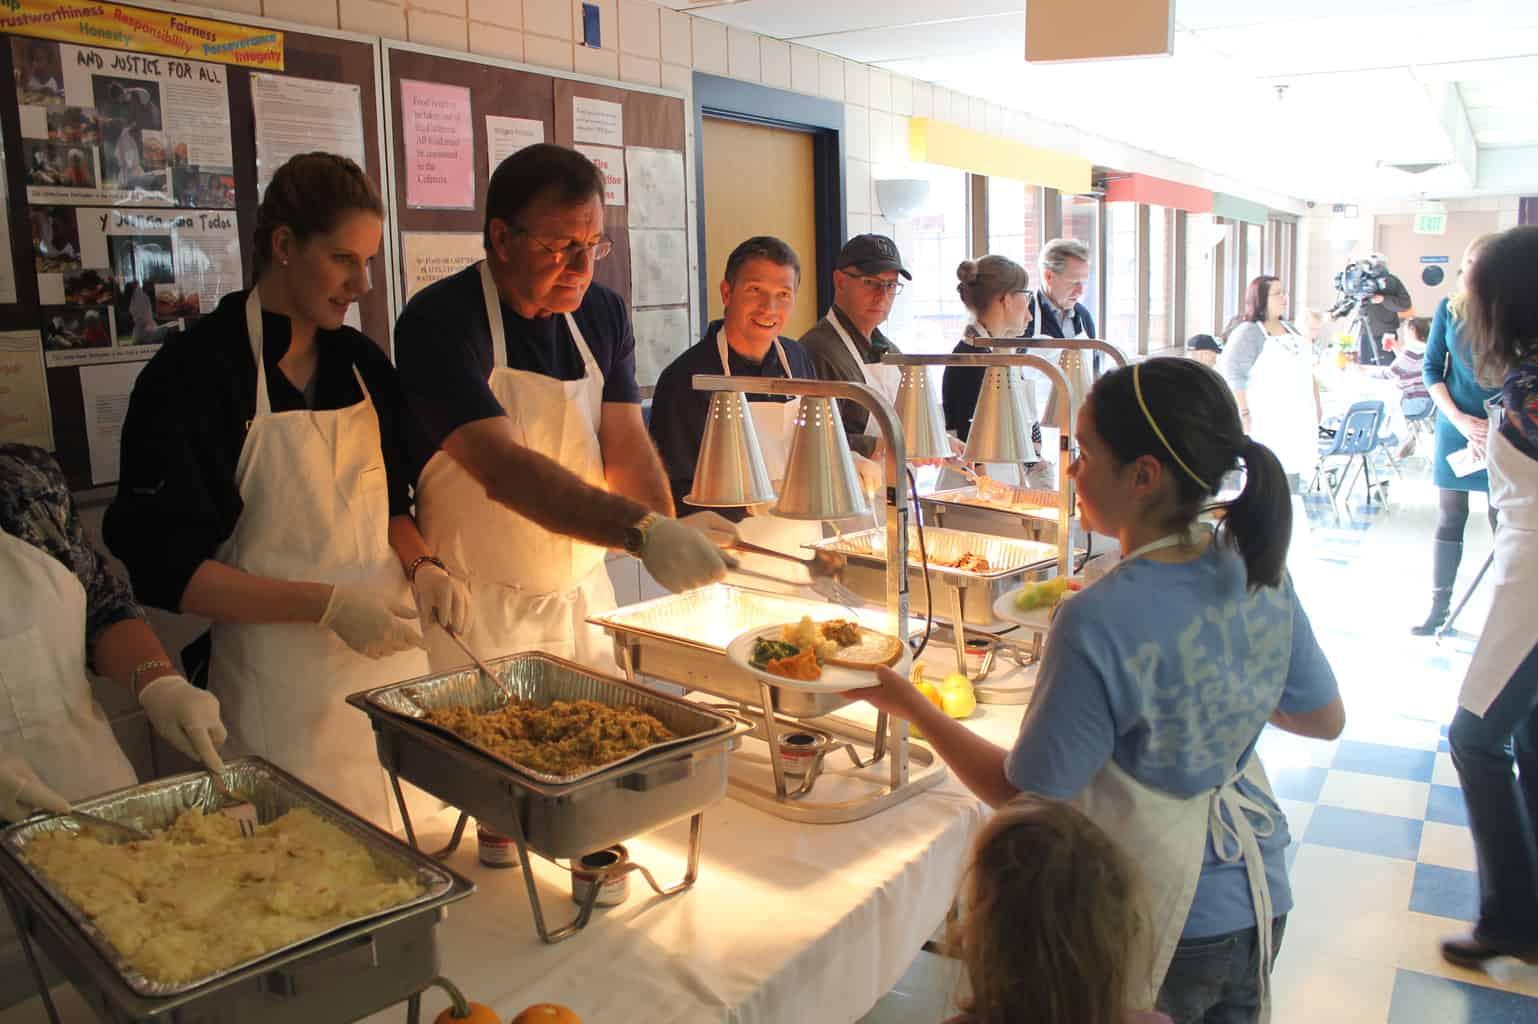 Samaritan House Volunteers To Serve Hundreds Of Homeless